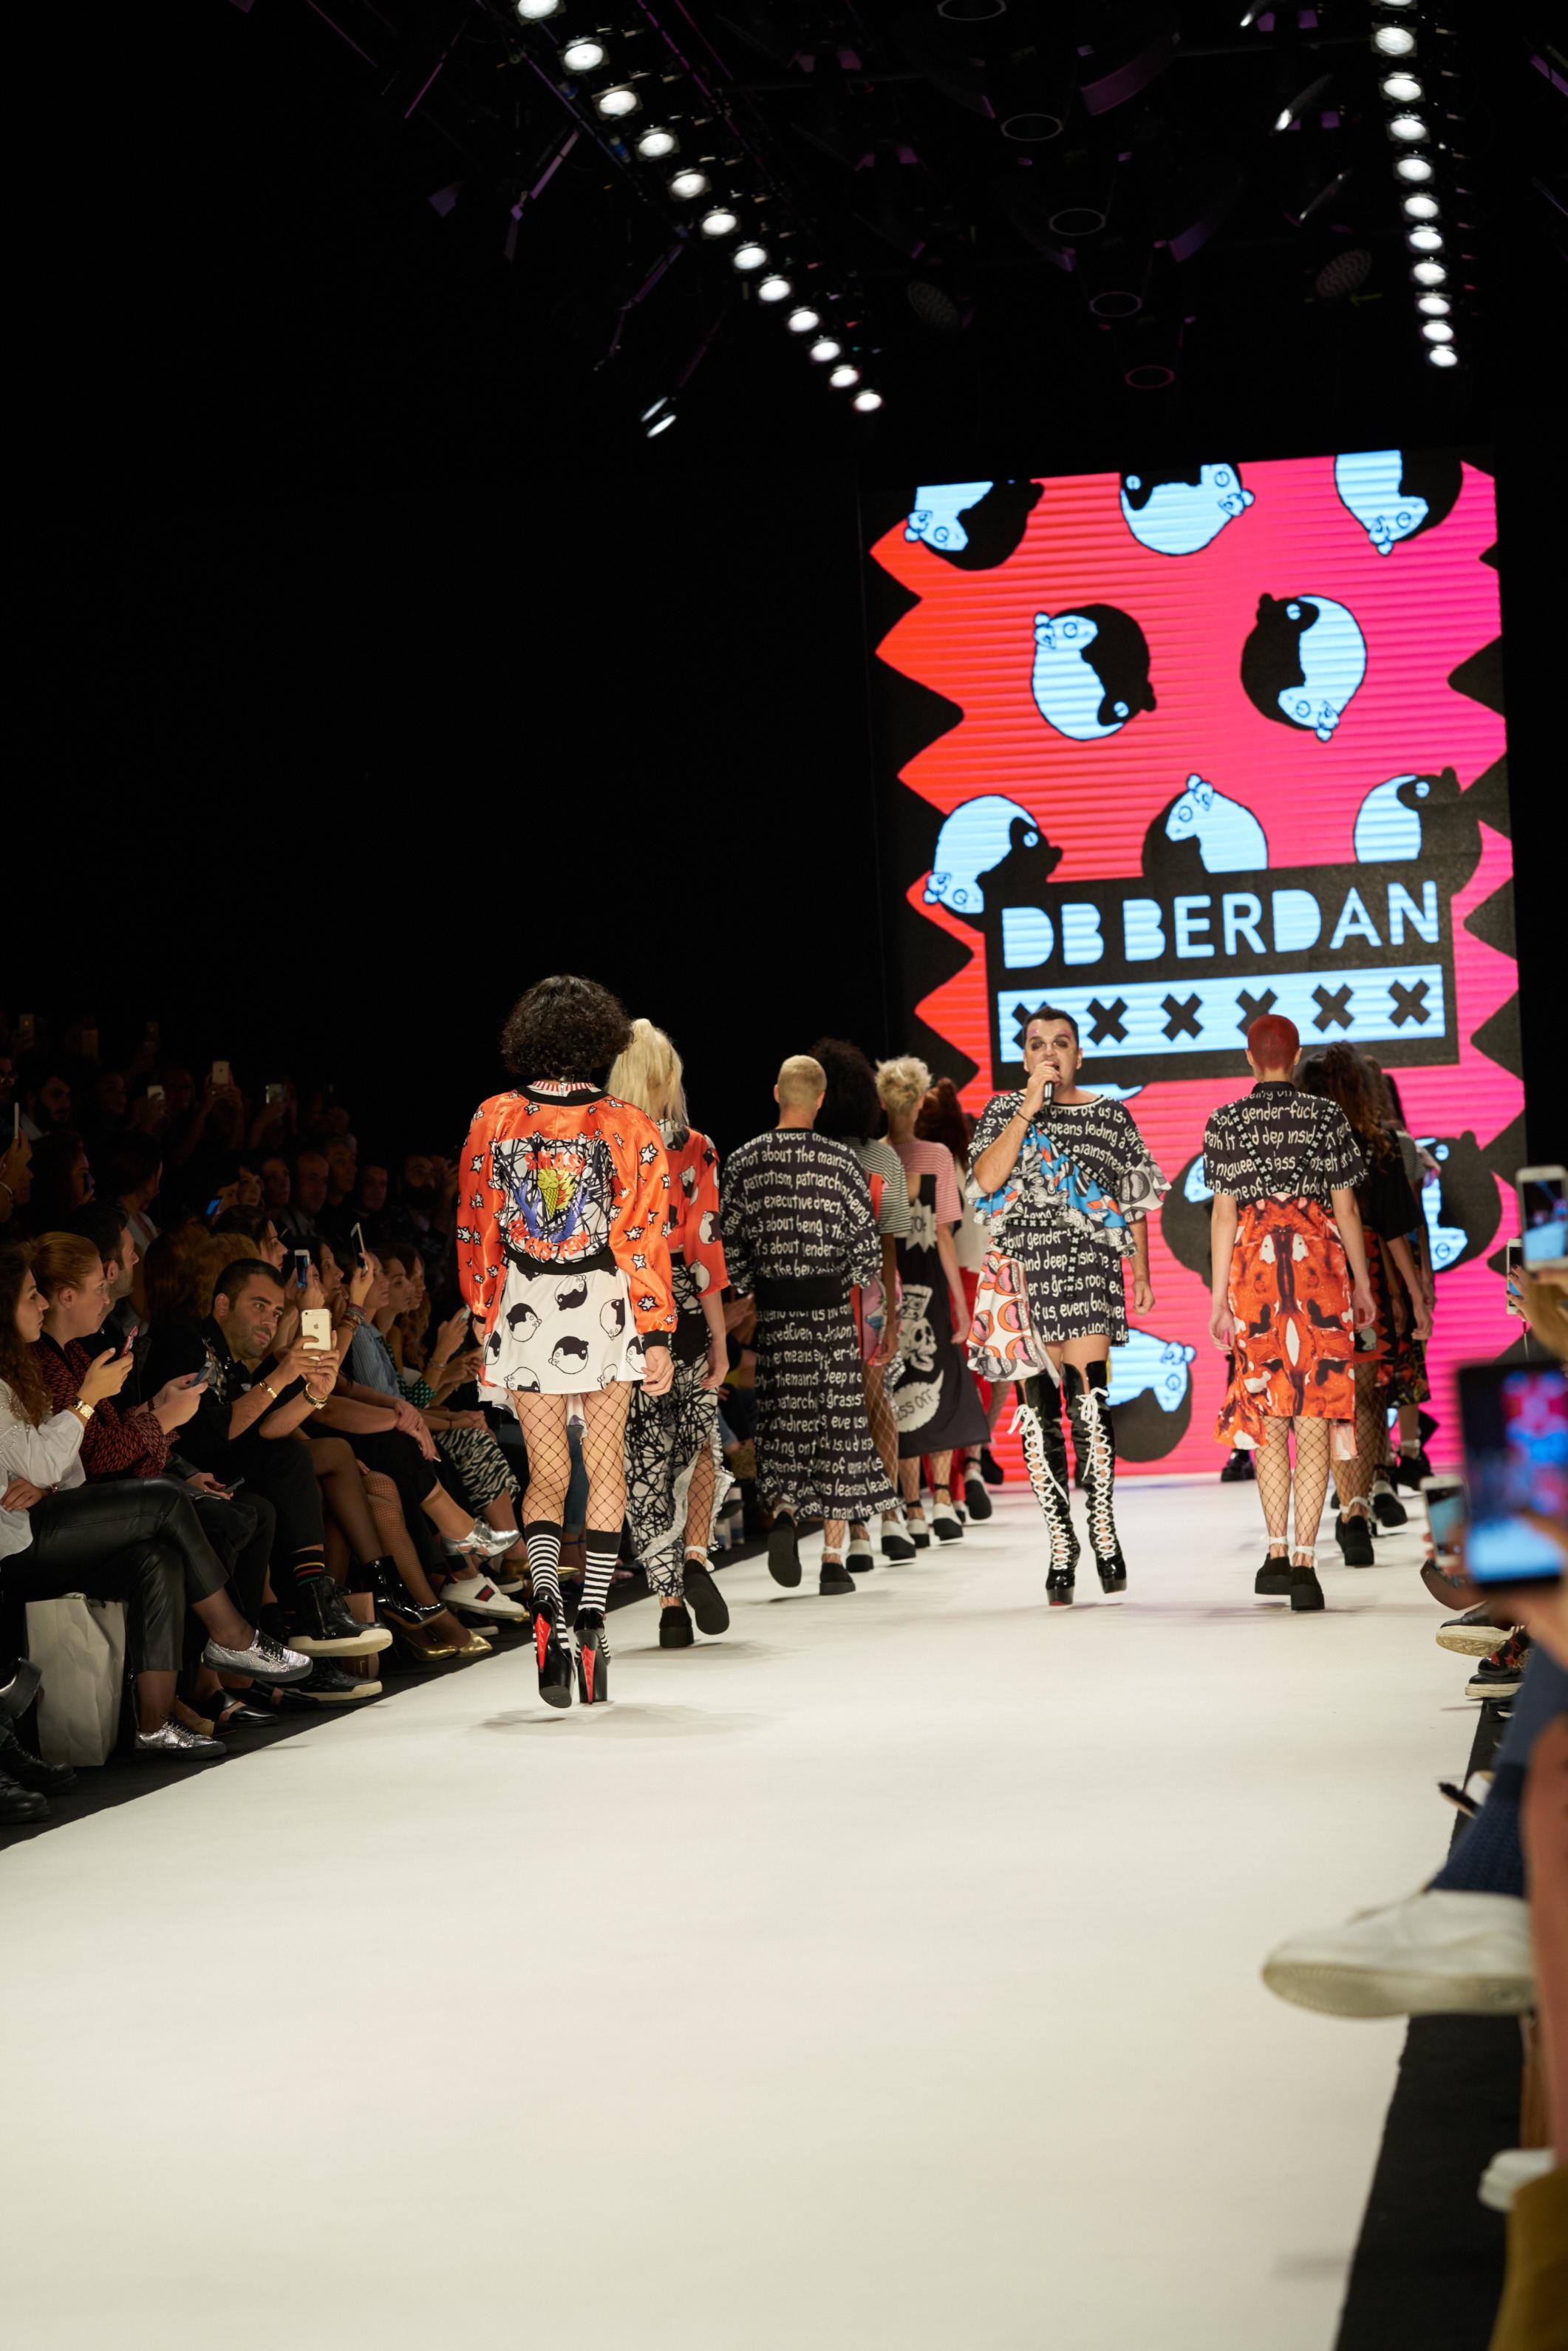 billur saatci, offnegiysem, street style, turkish style blogger, mbfwi, mercedes-benz fashion week istanbul, istanbul moda haftası, db berdan, deniz berdan